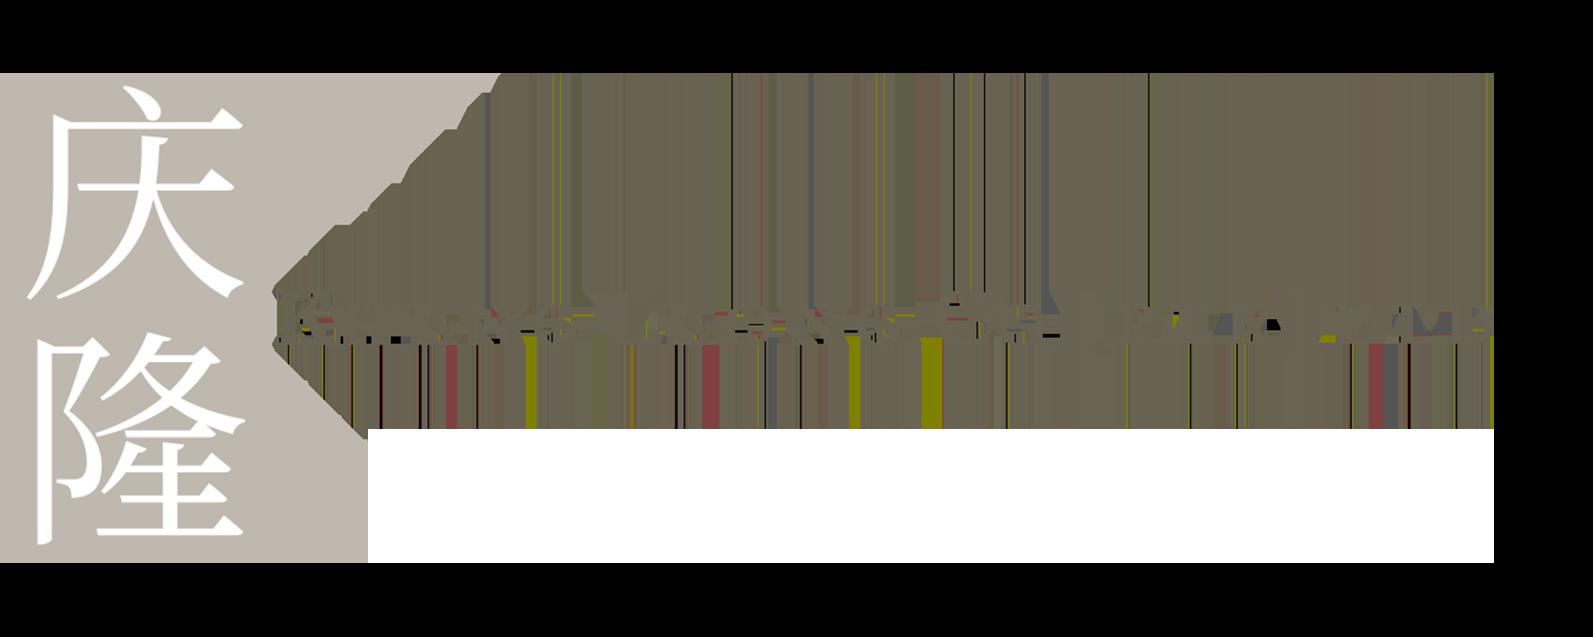 Kheng Leong